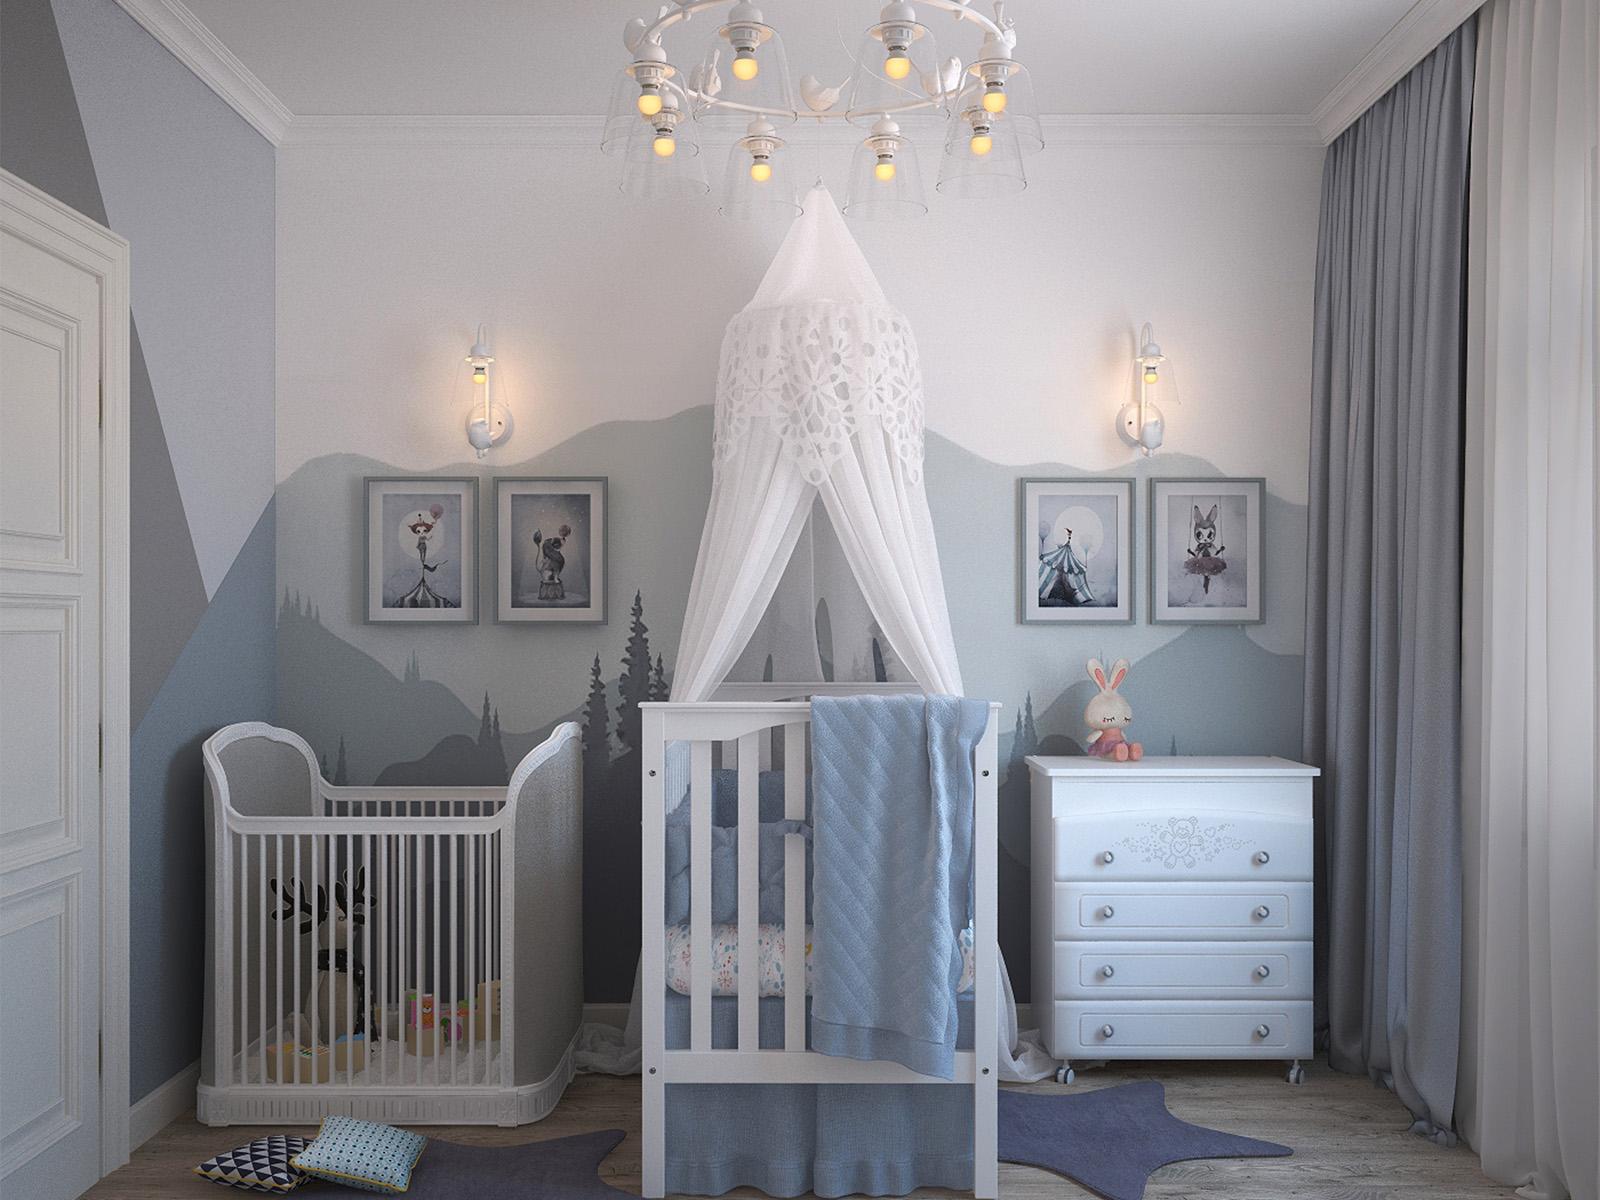 Kid's bedroom services in London, electrics, kid's bedroom design, lighting, wallpapering, painting, tiling, woodwork, decorating, window fitting, door fitting